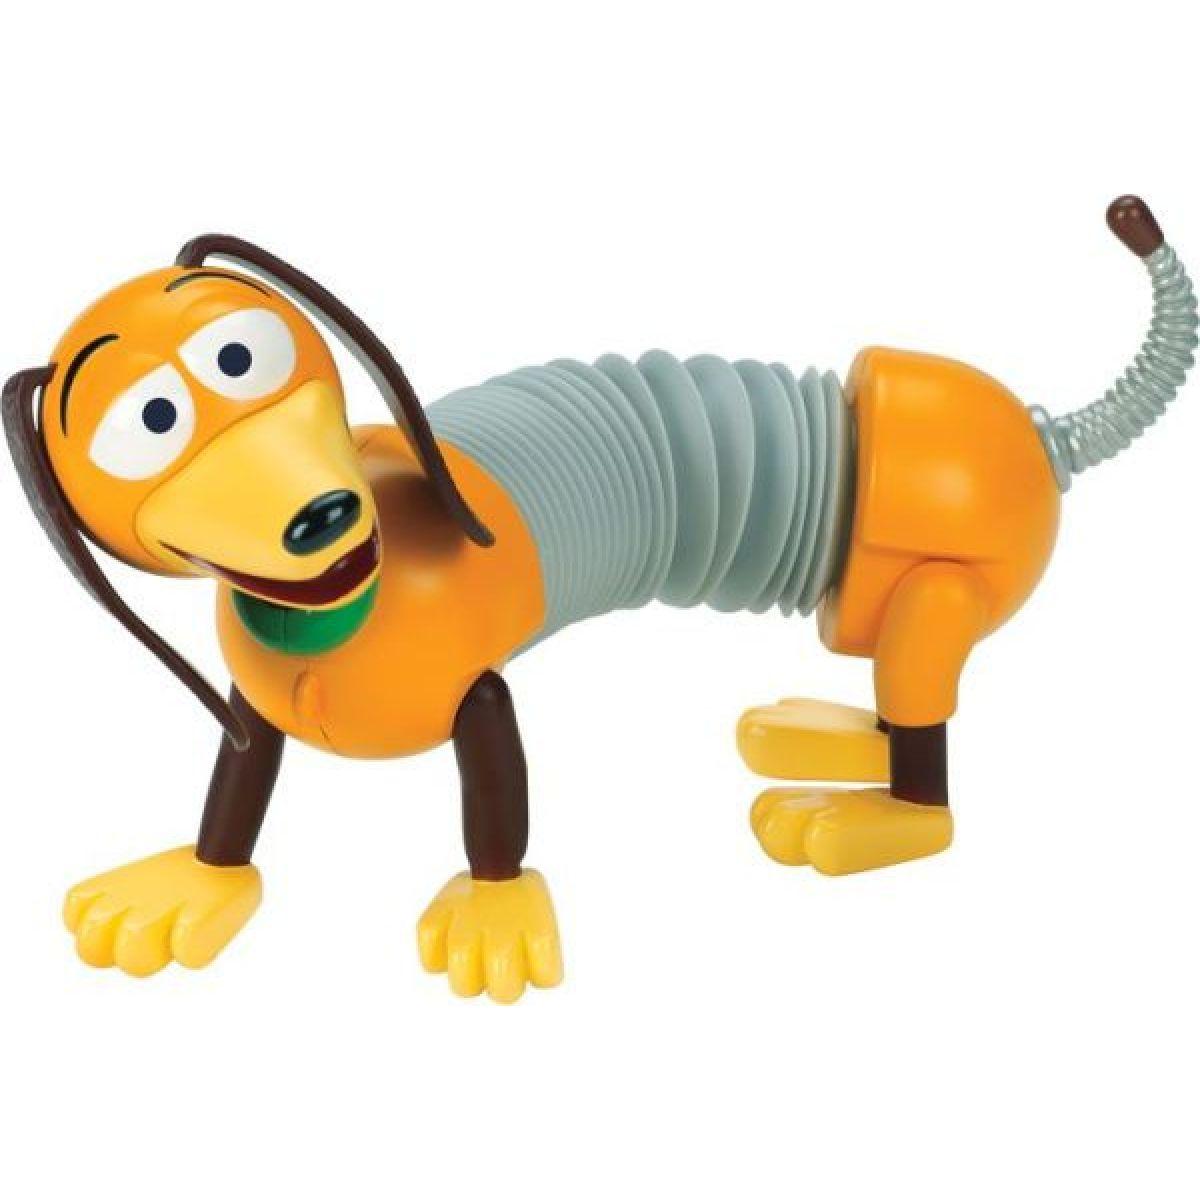 Mattel Toy story 4 figurka Slinky Dog ZigZag